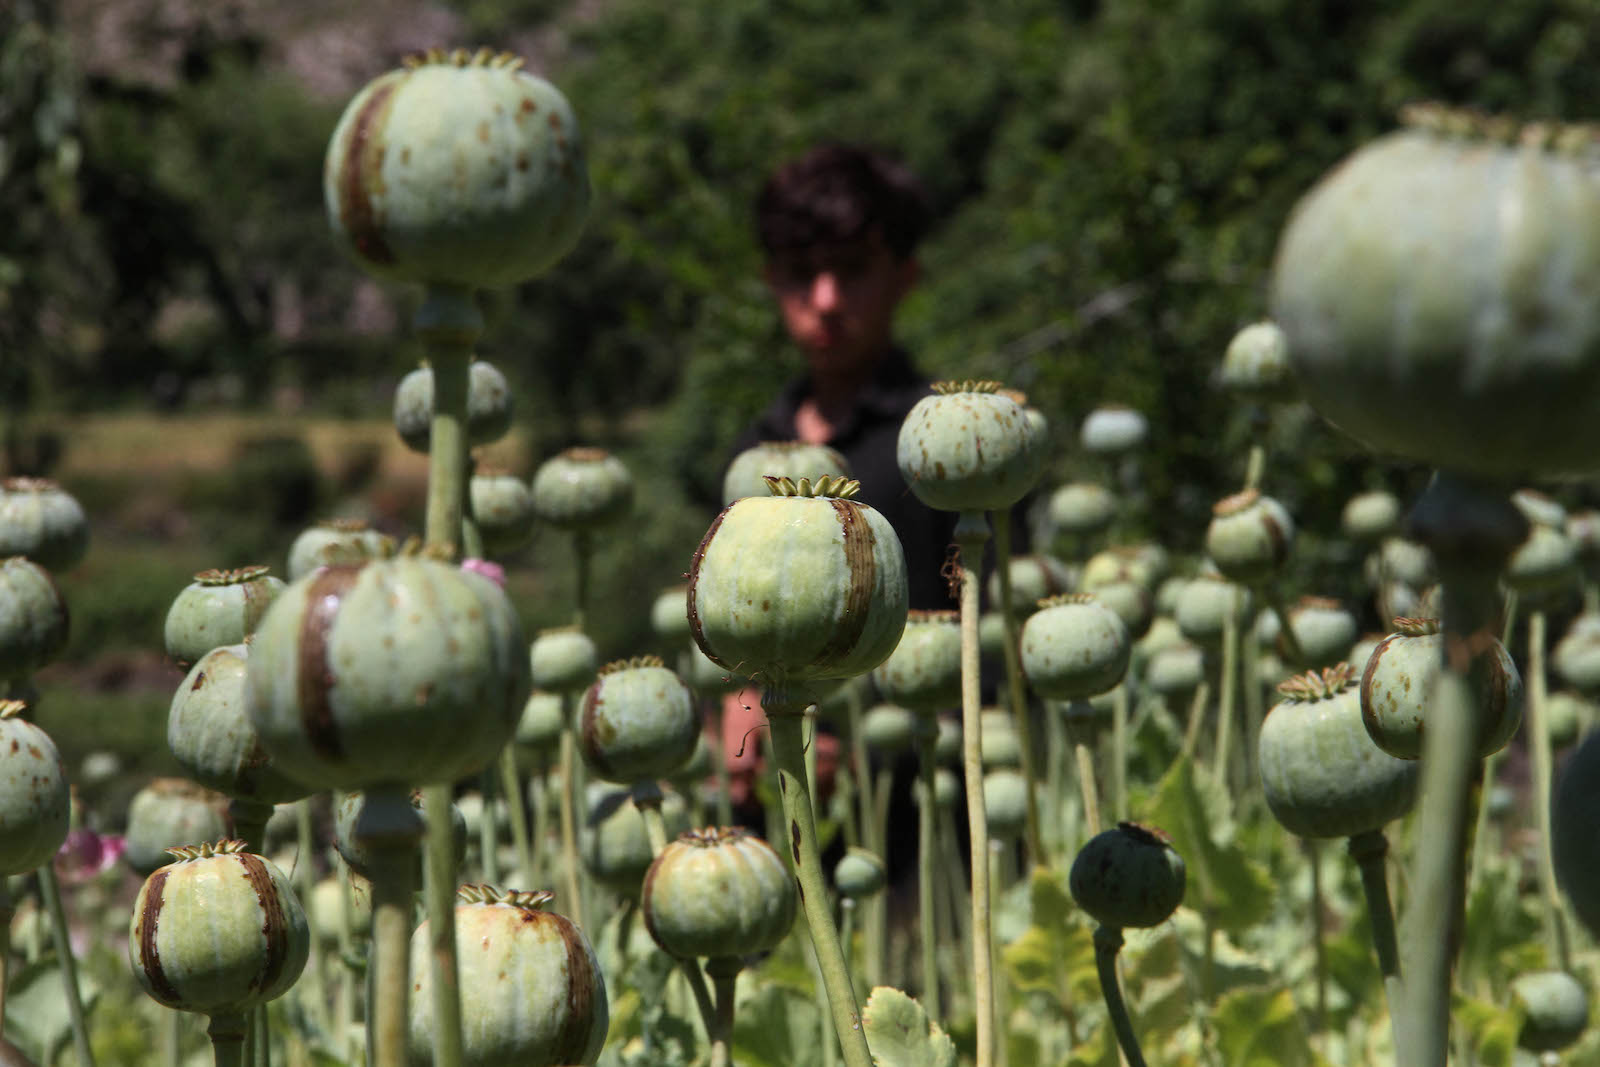 An Afghan farmer harvests opium sap from a poppy field in Dara-l-Nur, District of Nangarhar province, in 2020. Photo: AFP / Wali Sabawoon / NurPhoto